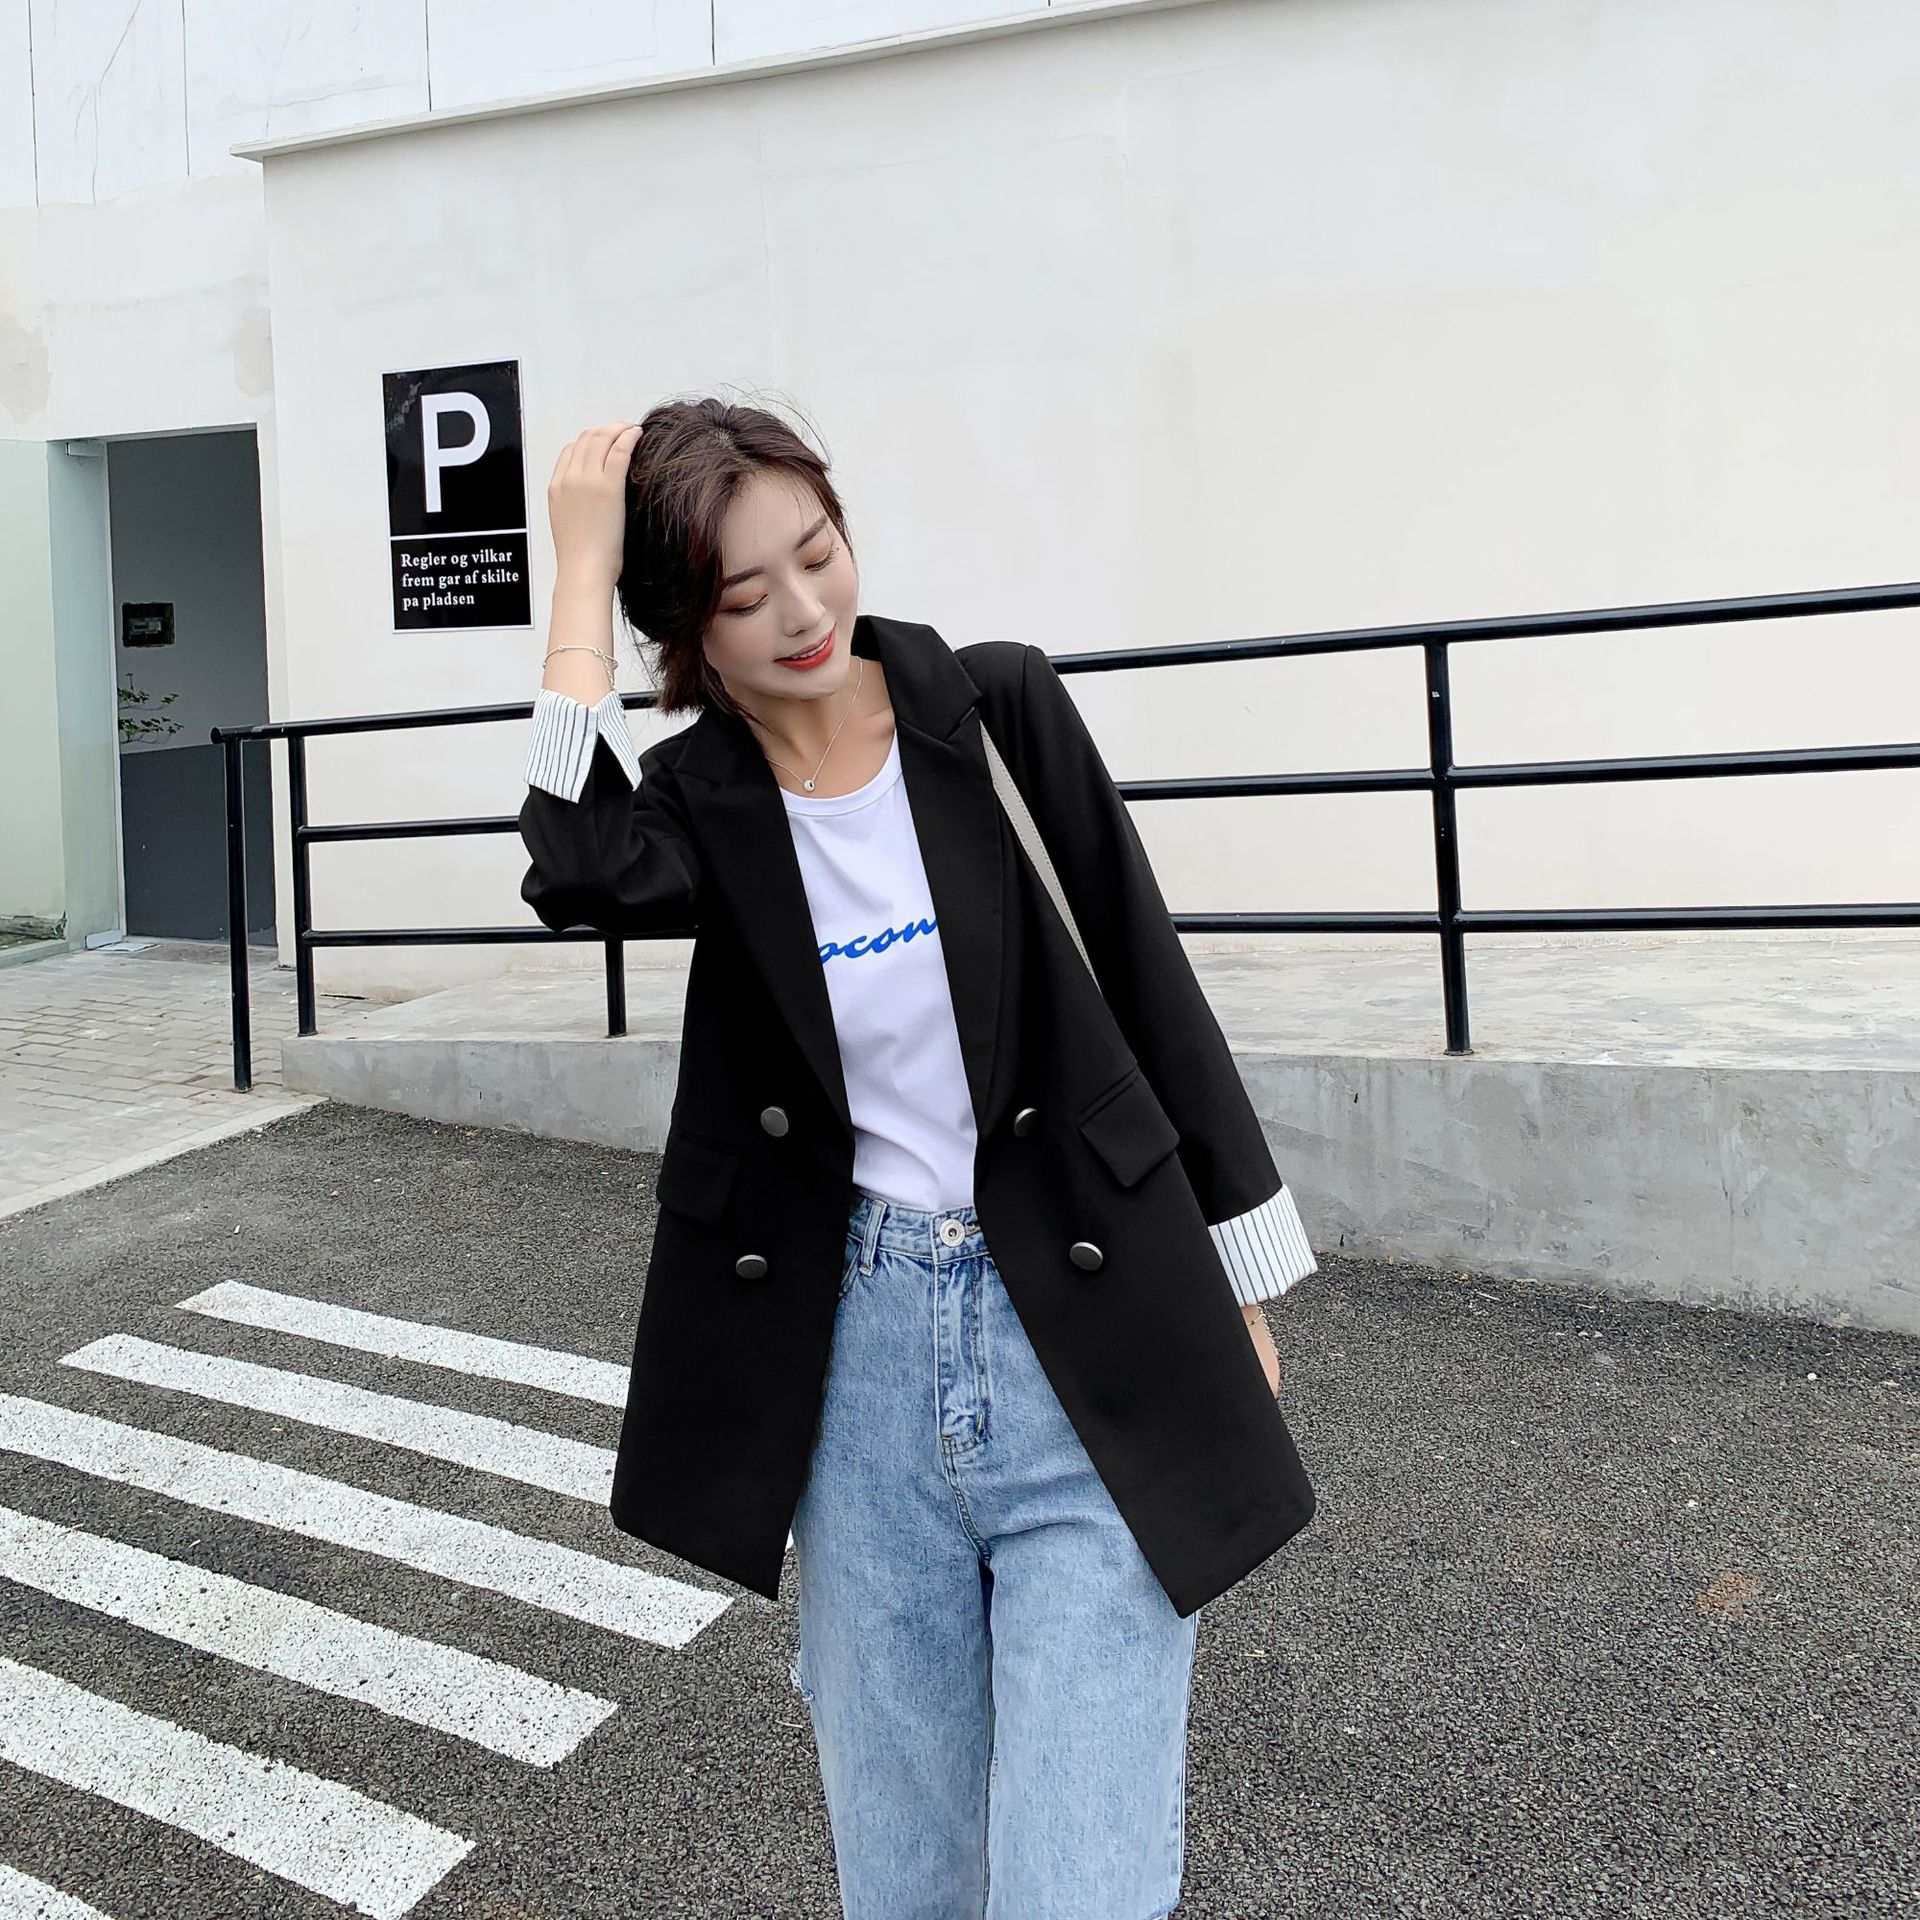 Elegant lady blazer 2019 autumn striped long sleeve jacket female Business double breasted suit Women's office jacket